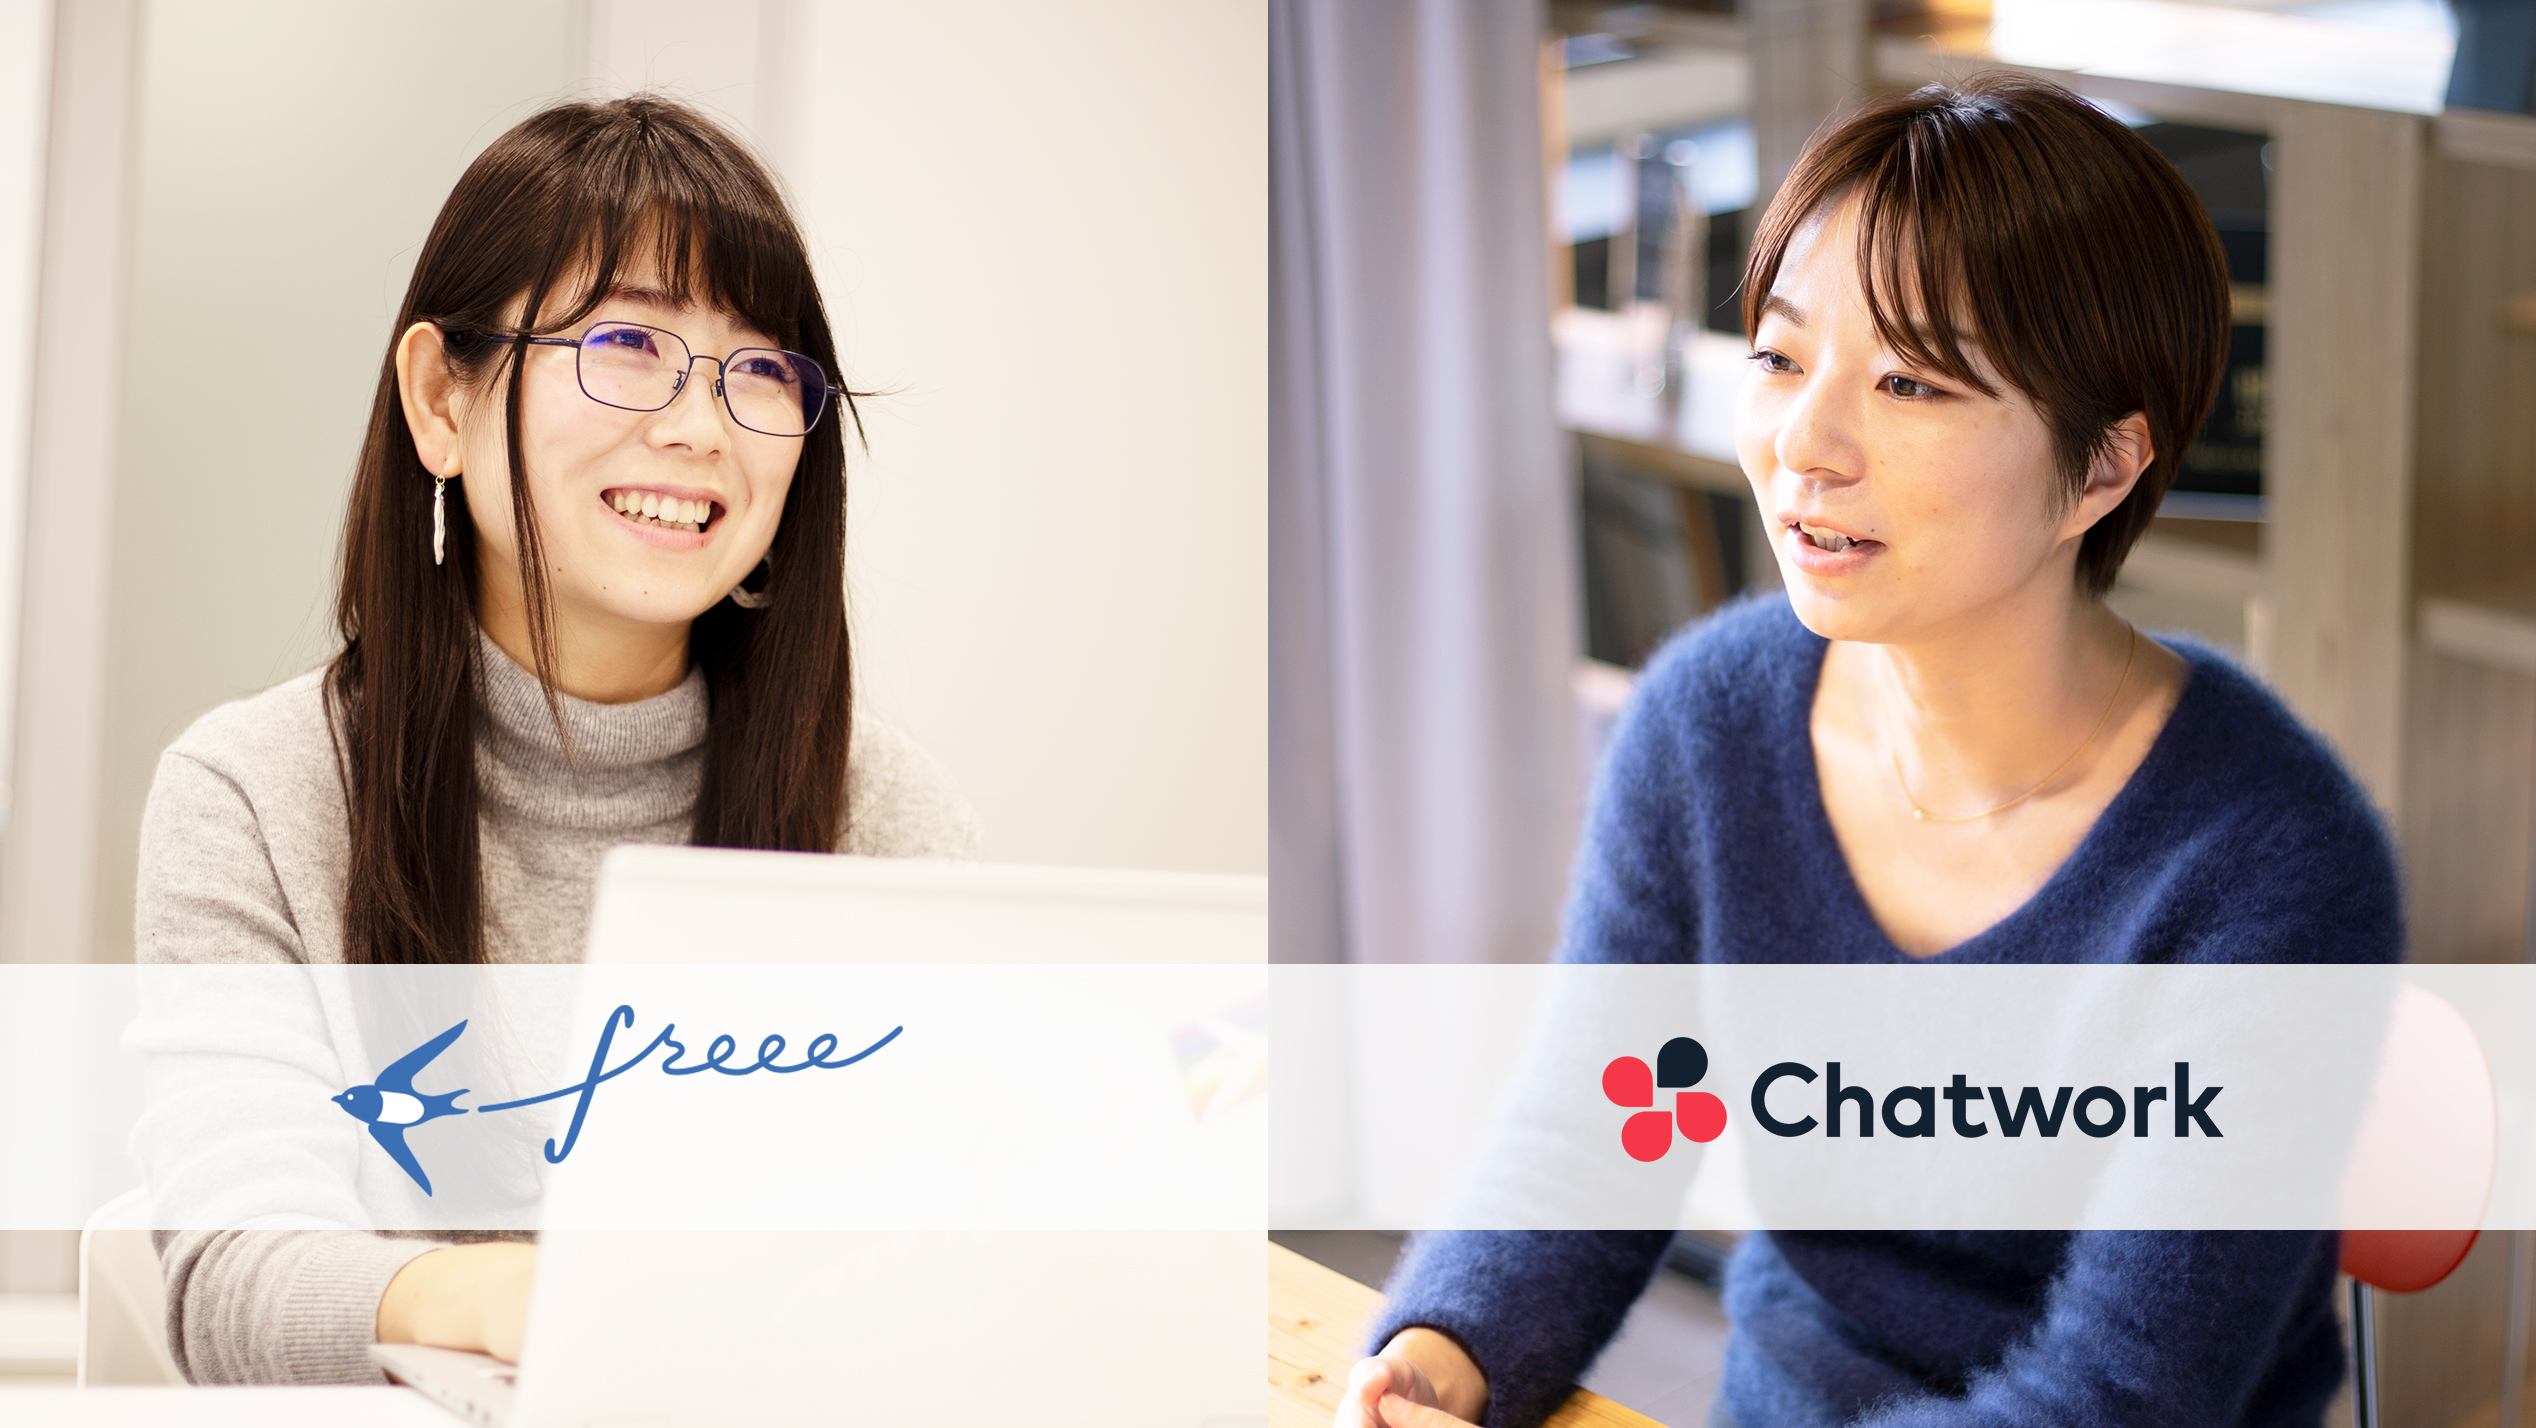 freeeとChatwork、2019年のエンジニア採用チャネルをすべて公開